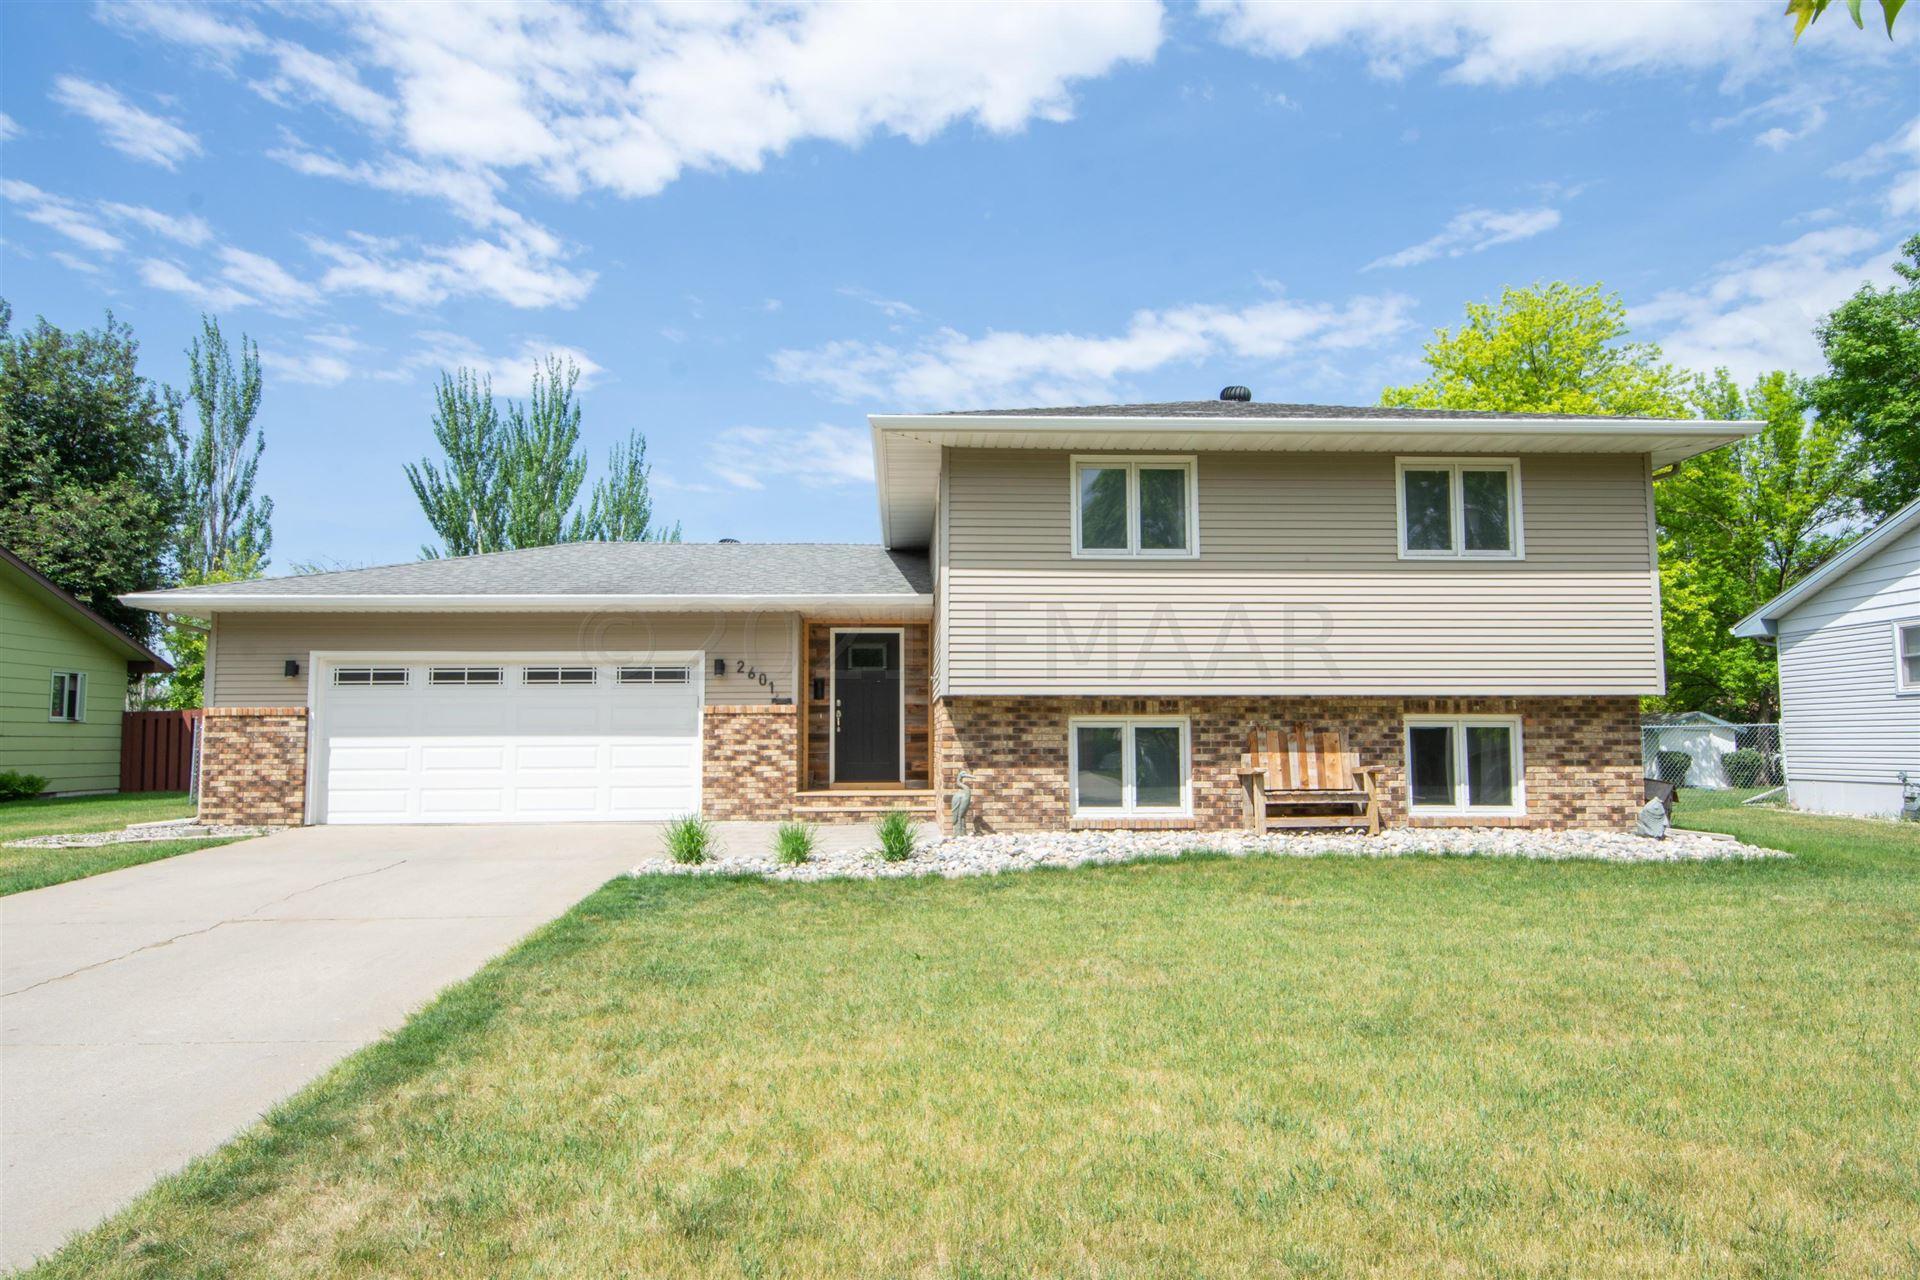 2601 ATLANTIC Drive S, Fargo, ND 58103 - #: 21-3049